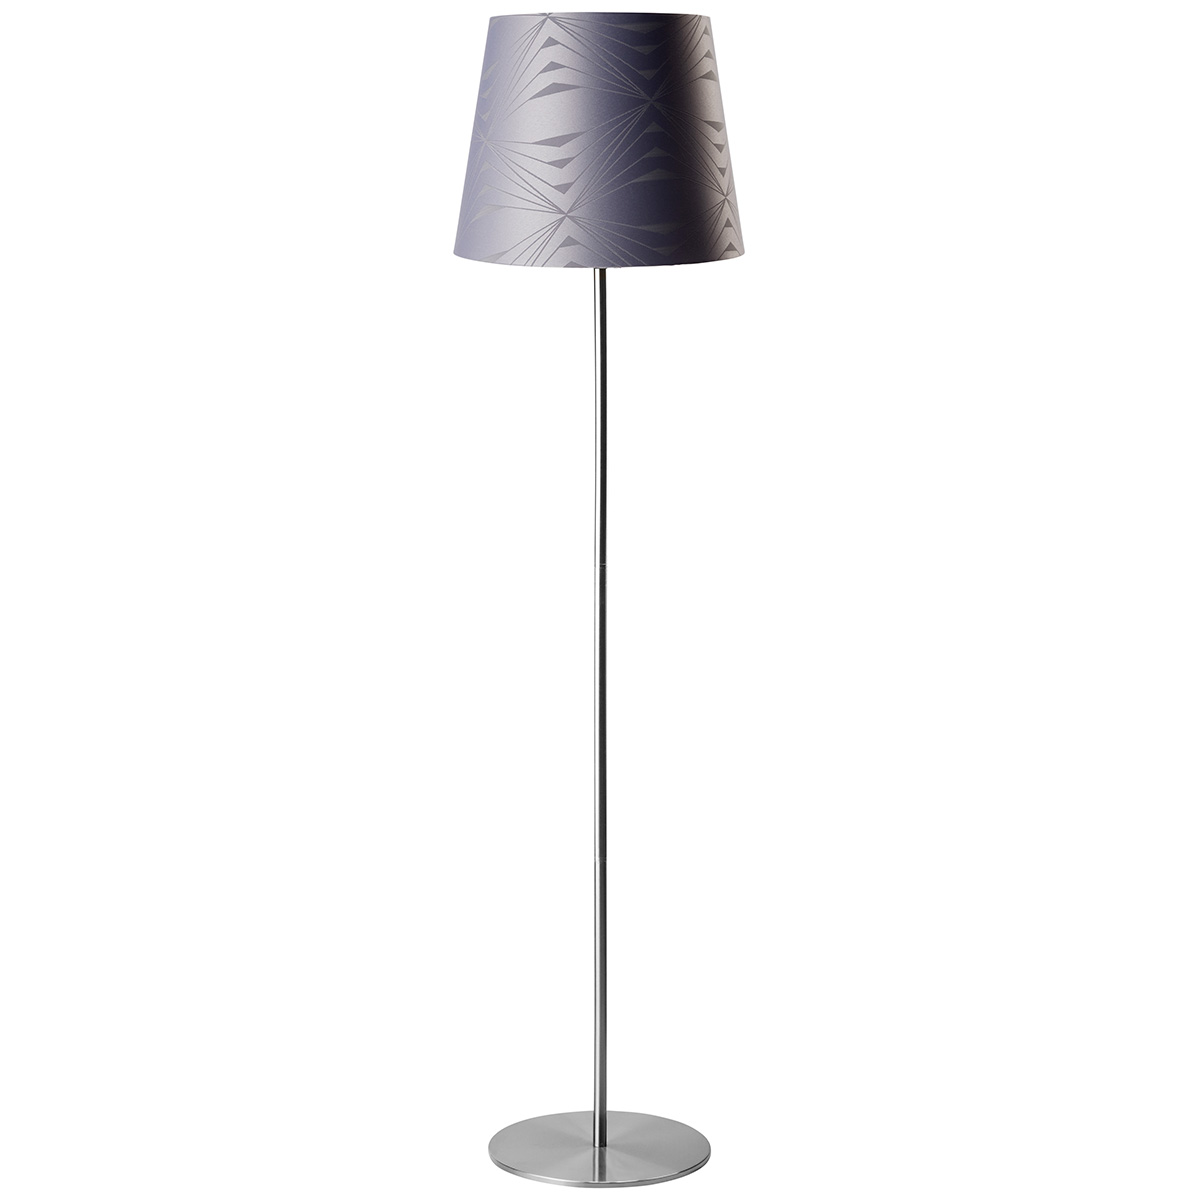 Georg Jensen Damask gulvlampe - Krystal - Grå